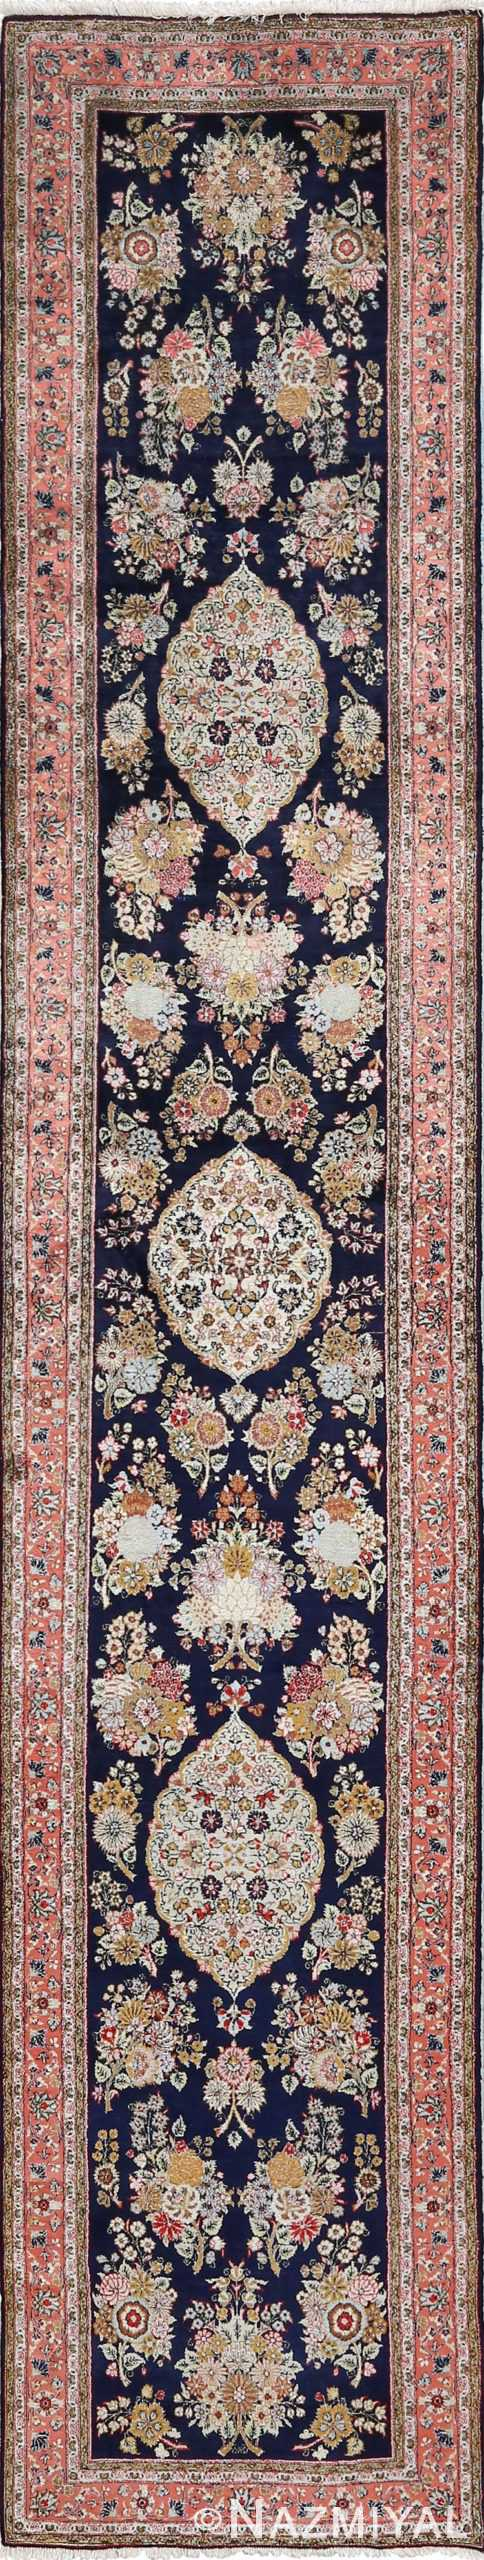 fine silk vintage qum persian rug runner 51059 Nazmiyal